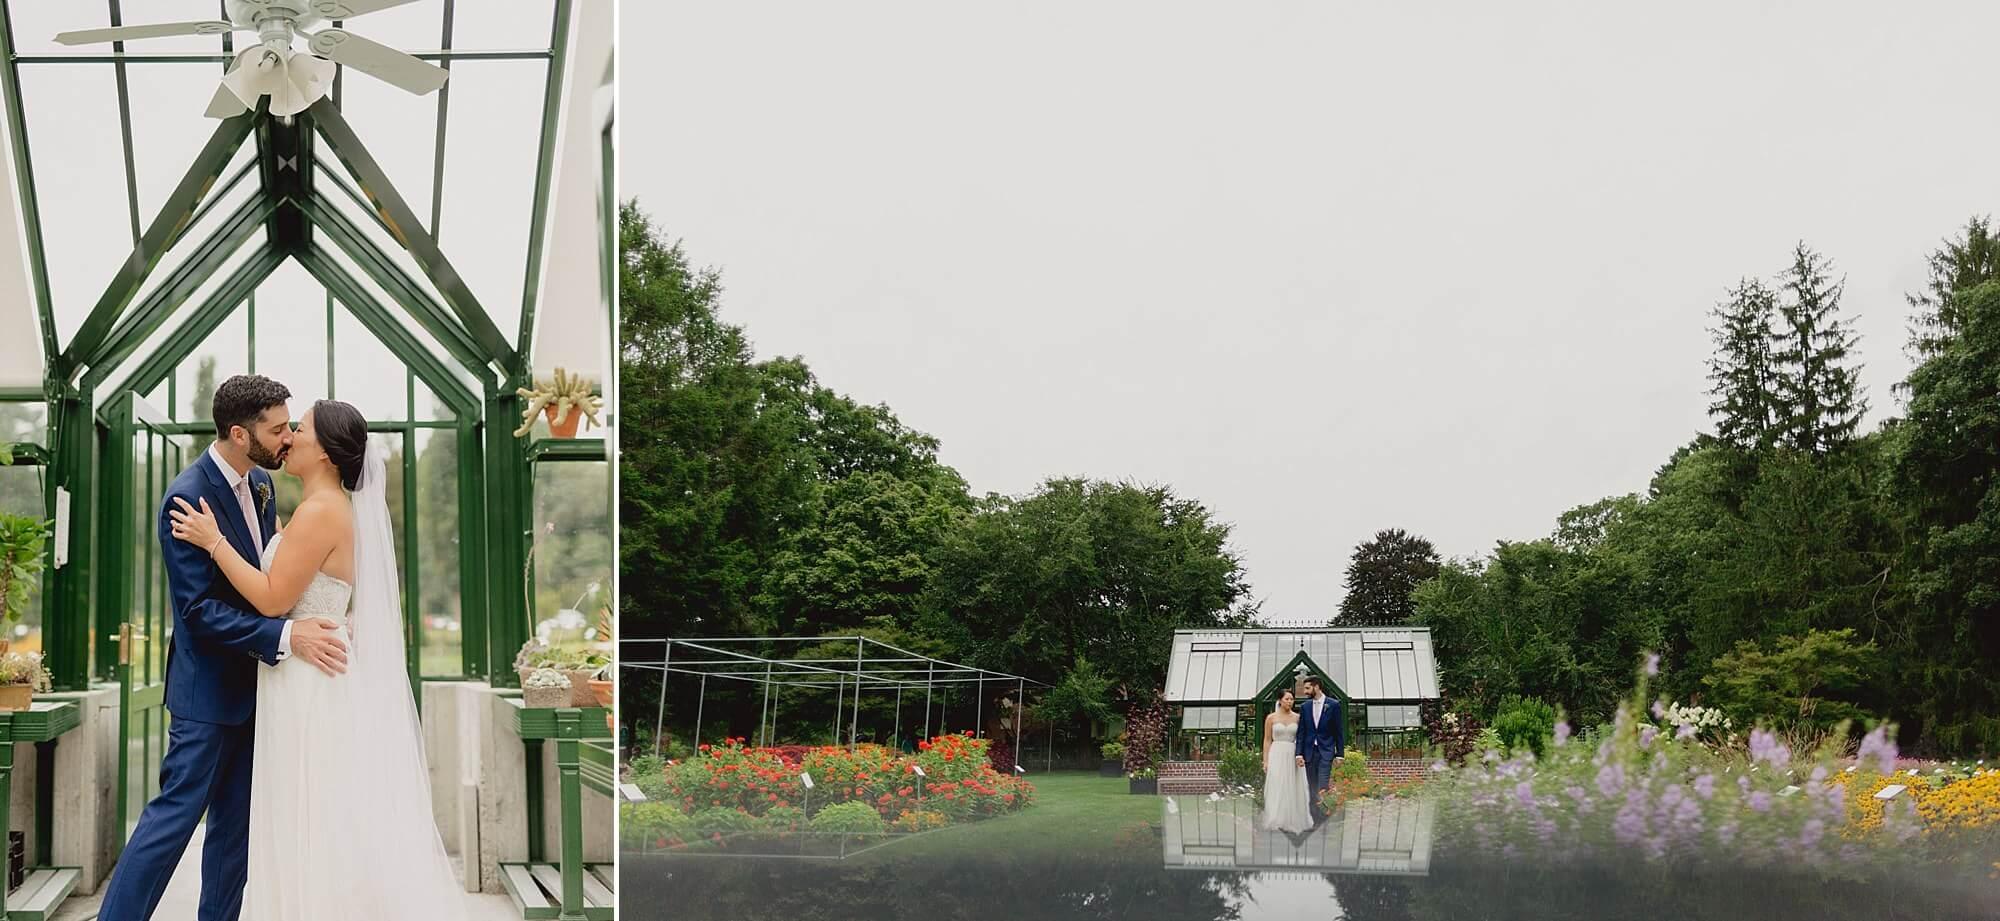 Gardens At Elm Bank Wedding-17.jpg